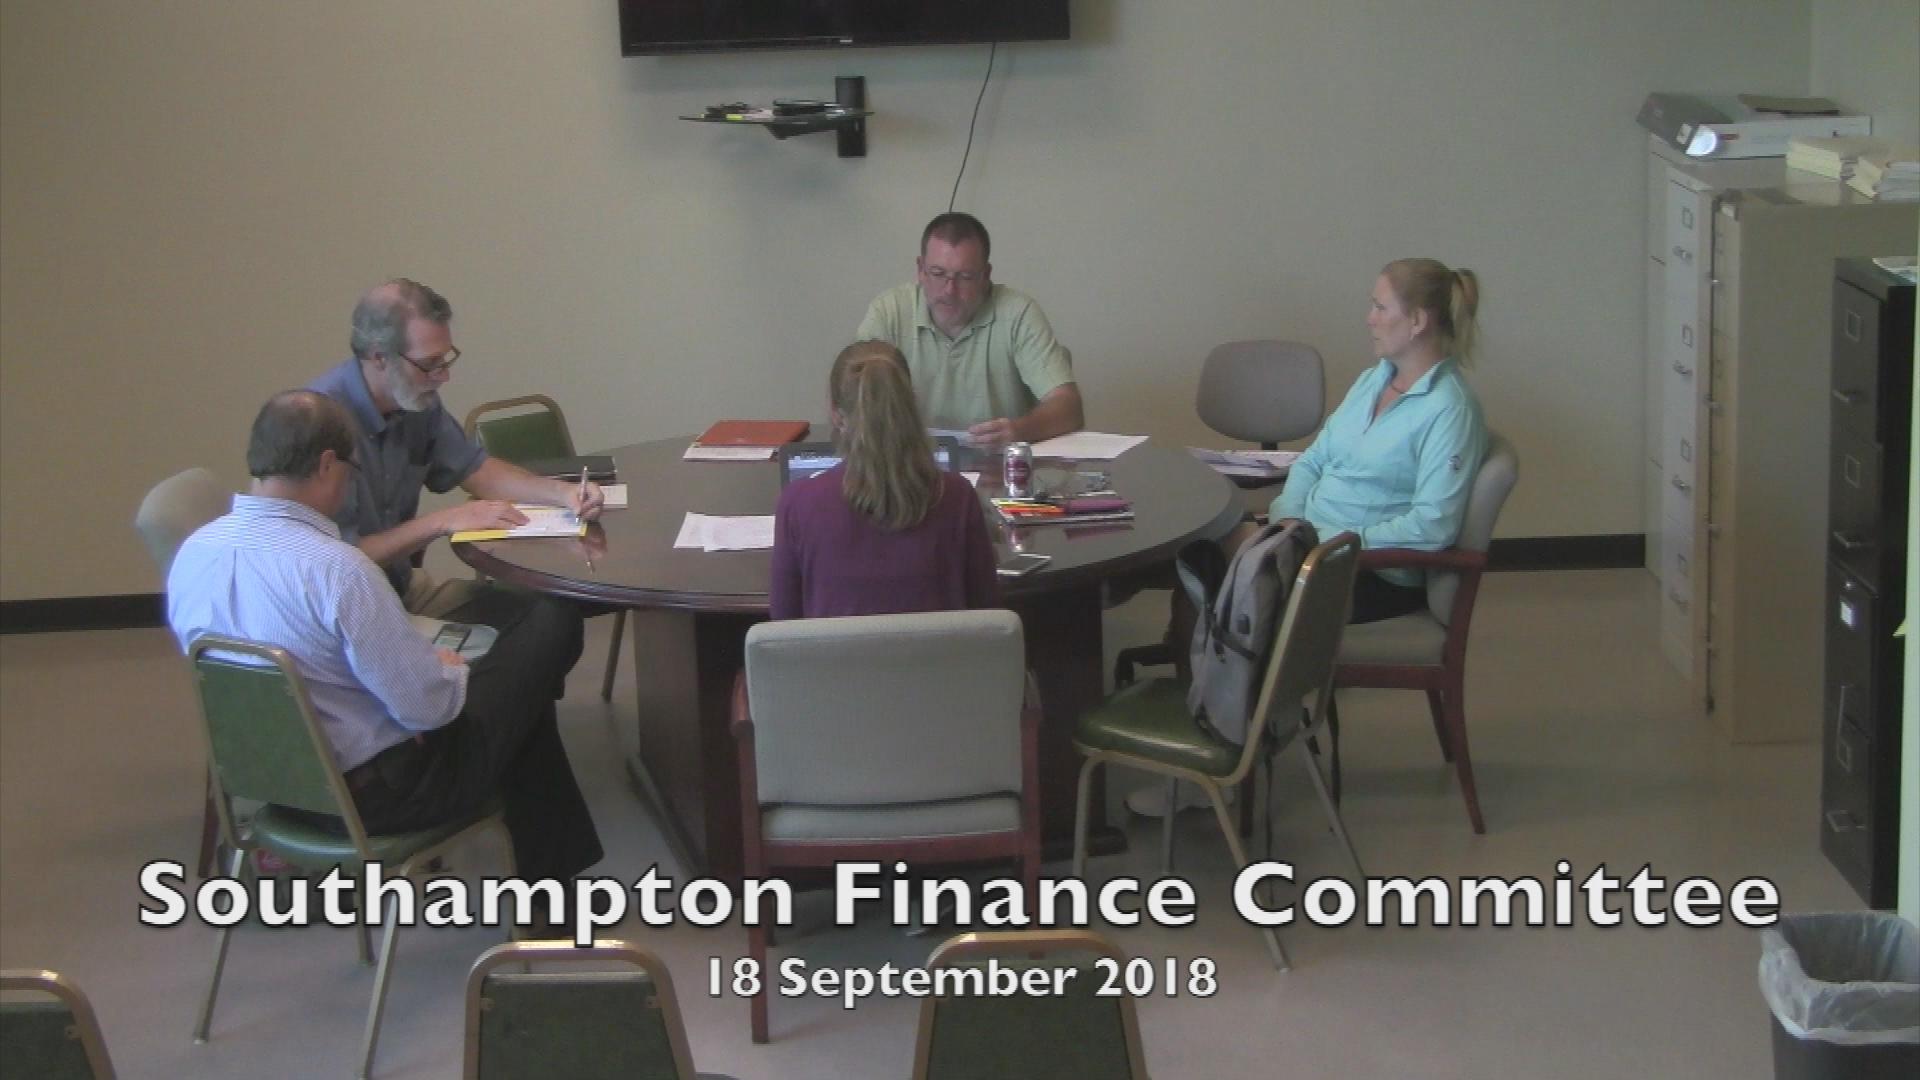 Southampton Finance Committee 09.18.18